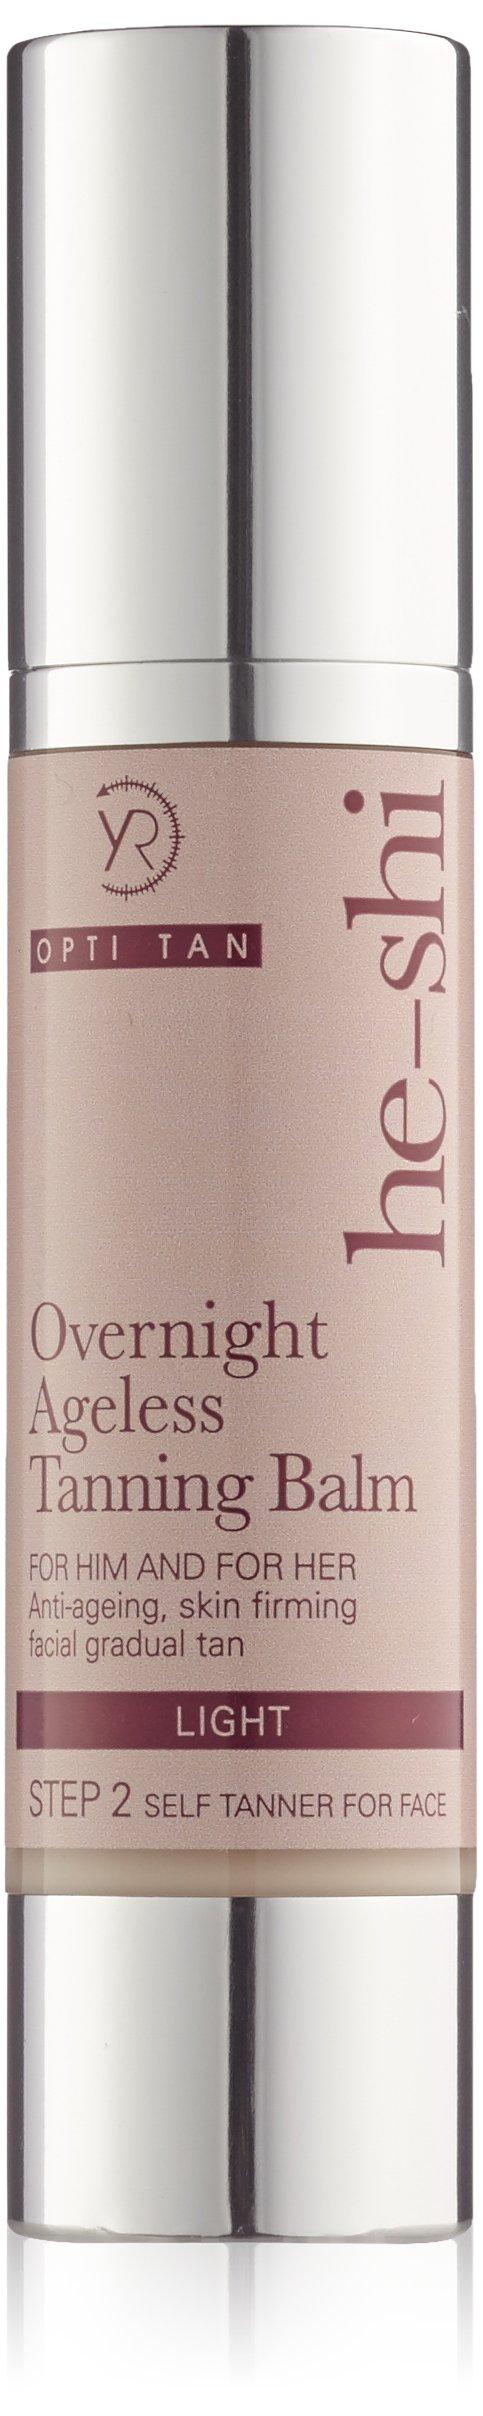 he-shi Overnight Ageless Tanning Balm 50 ml